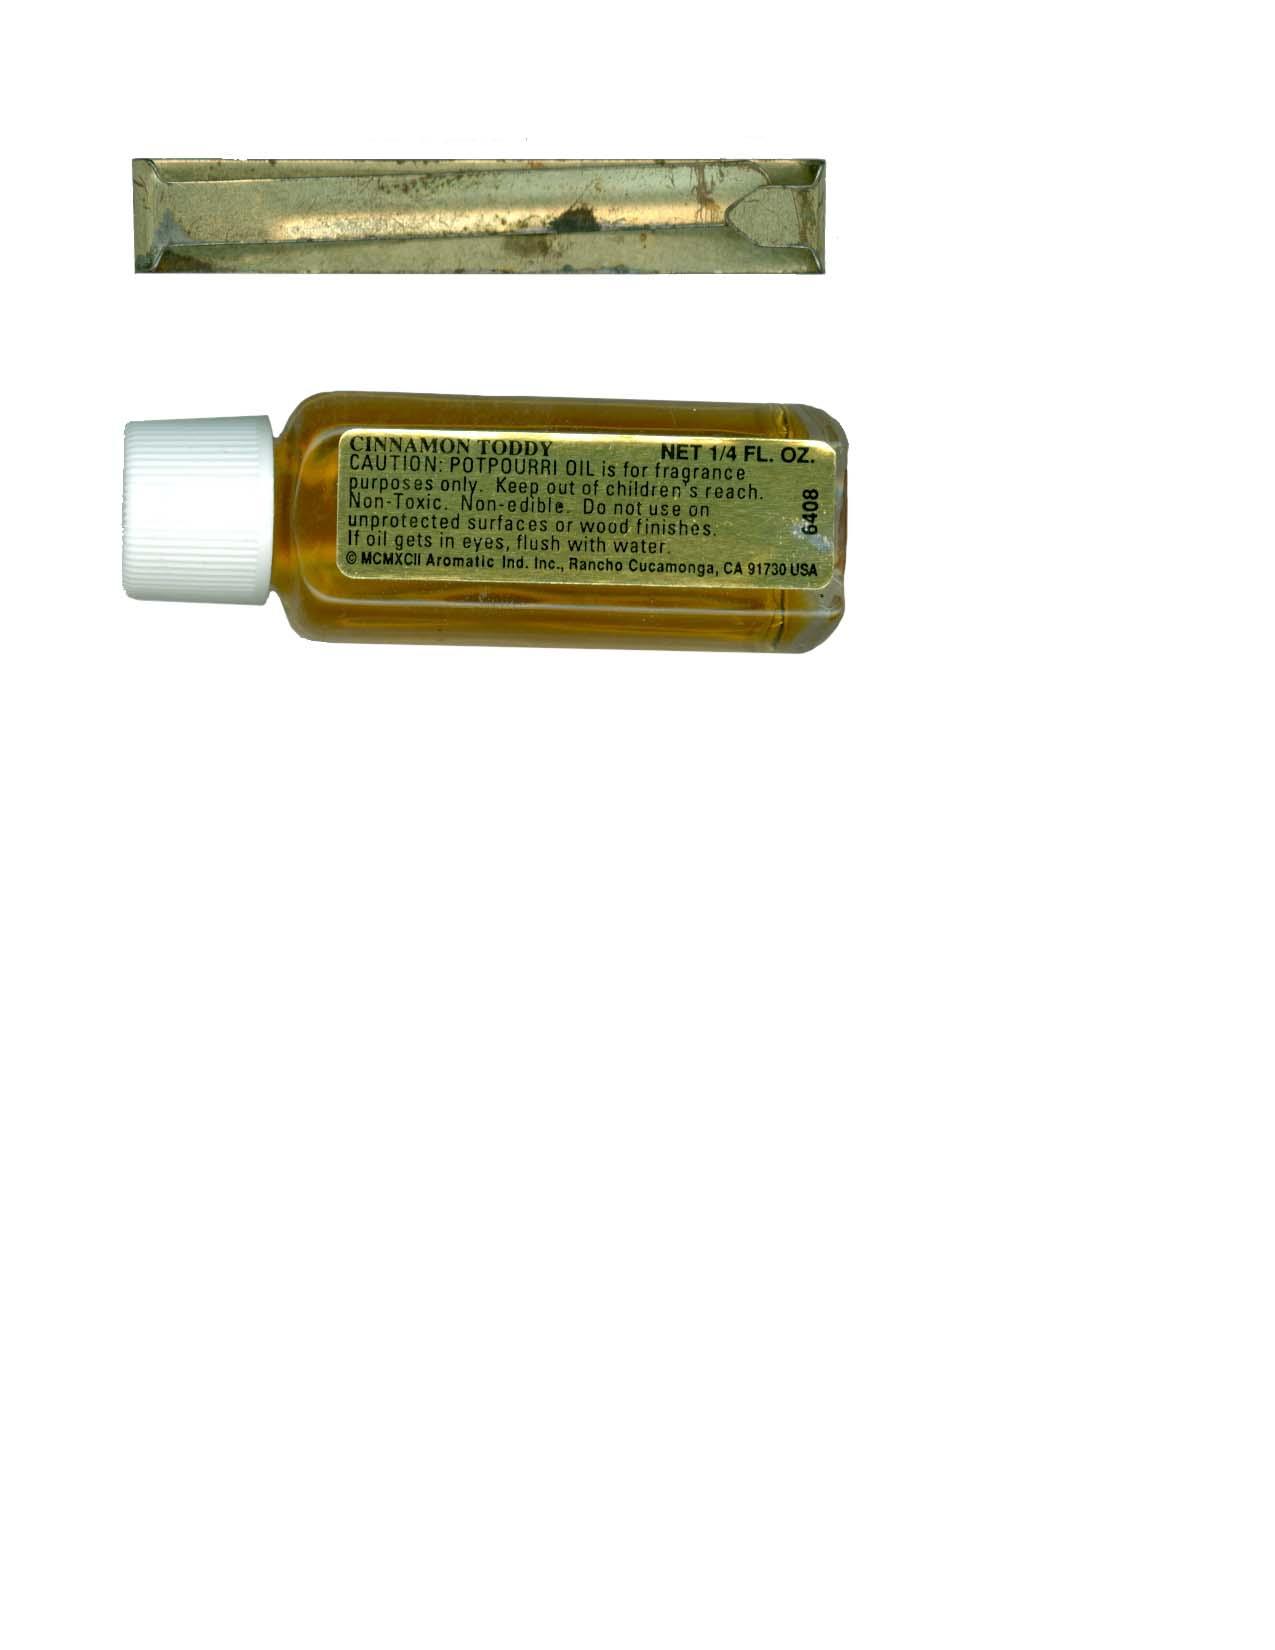 hair thingie and cinnamon essential oil.jpg